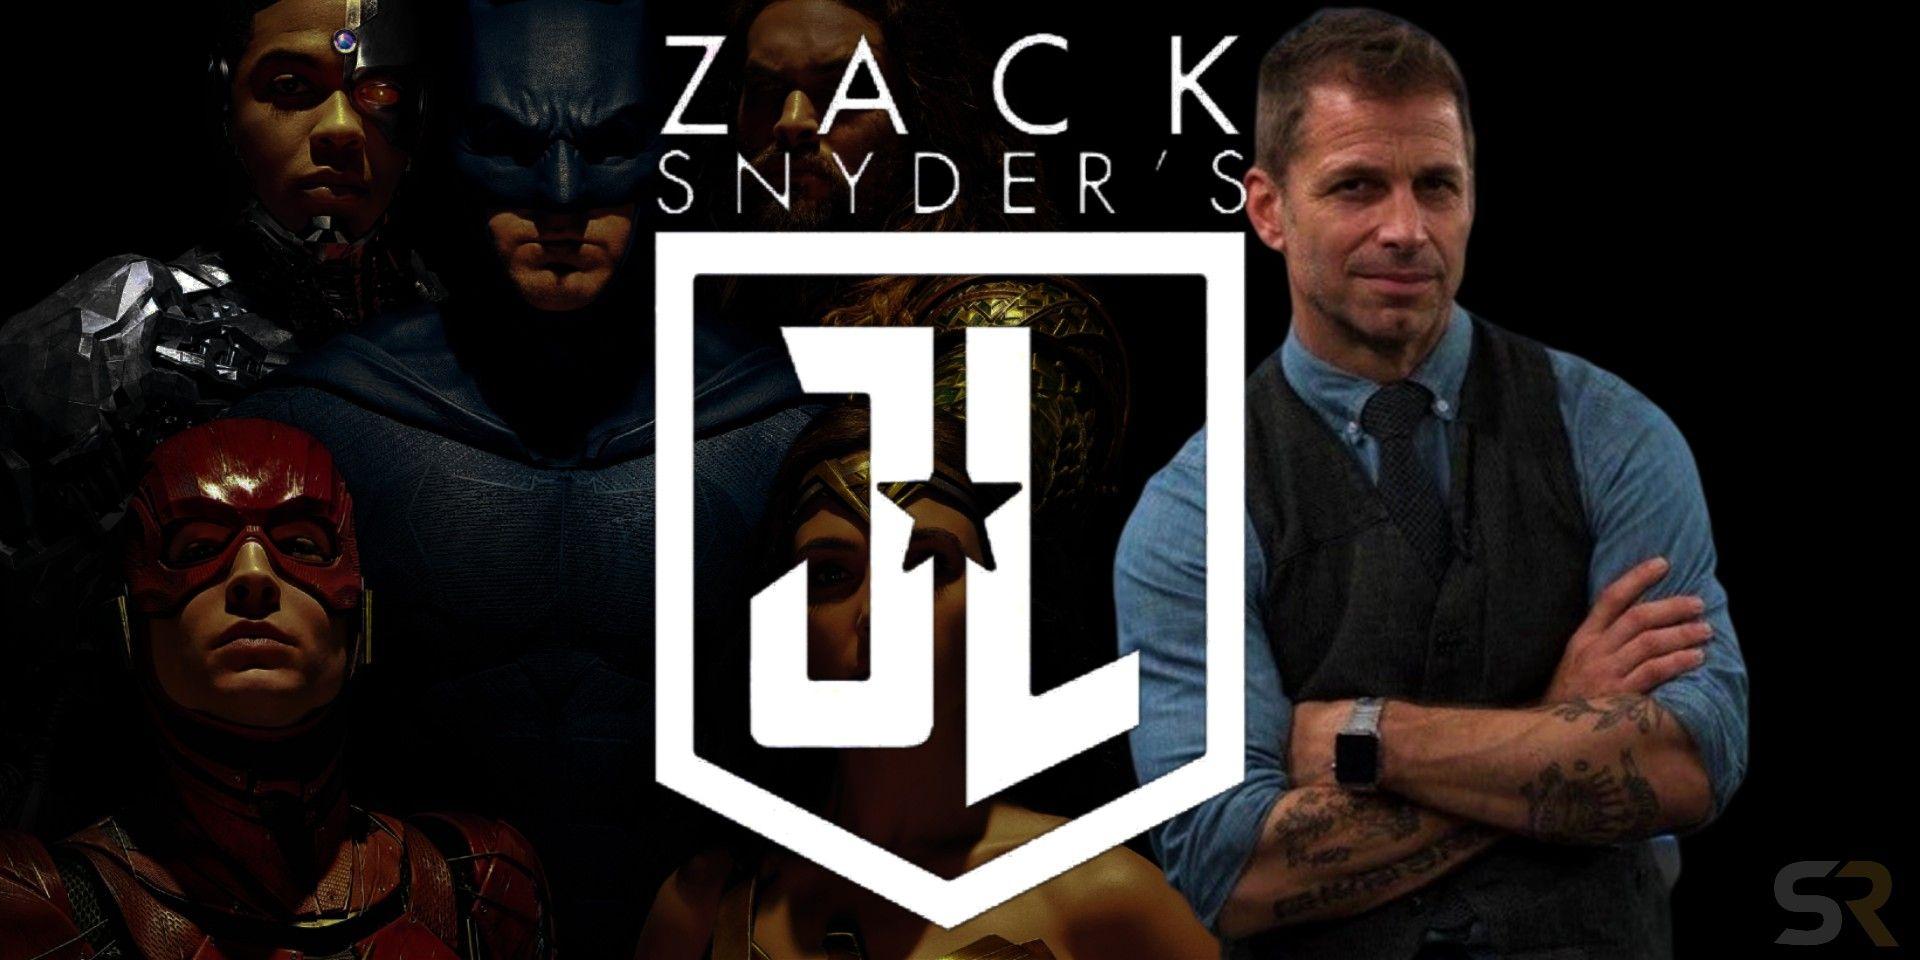 Justice League Cast & More React To Official Snyder Cut Announcement